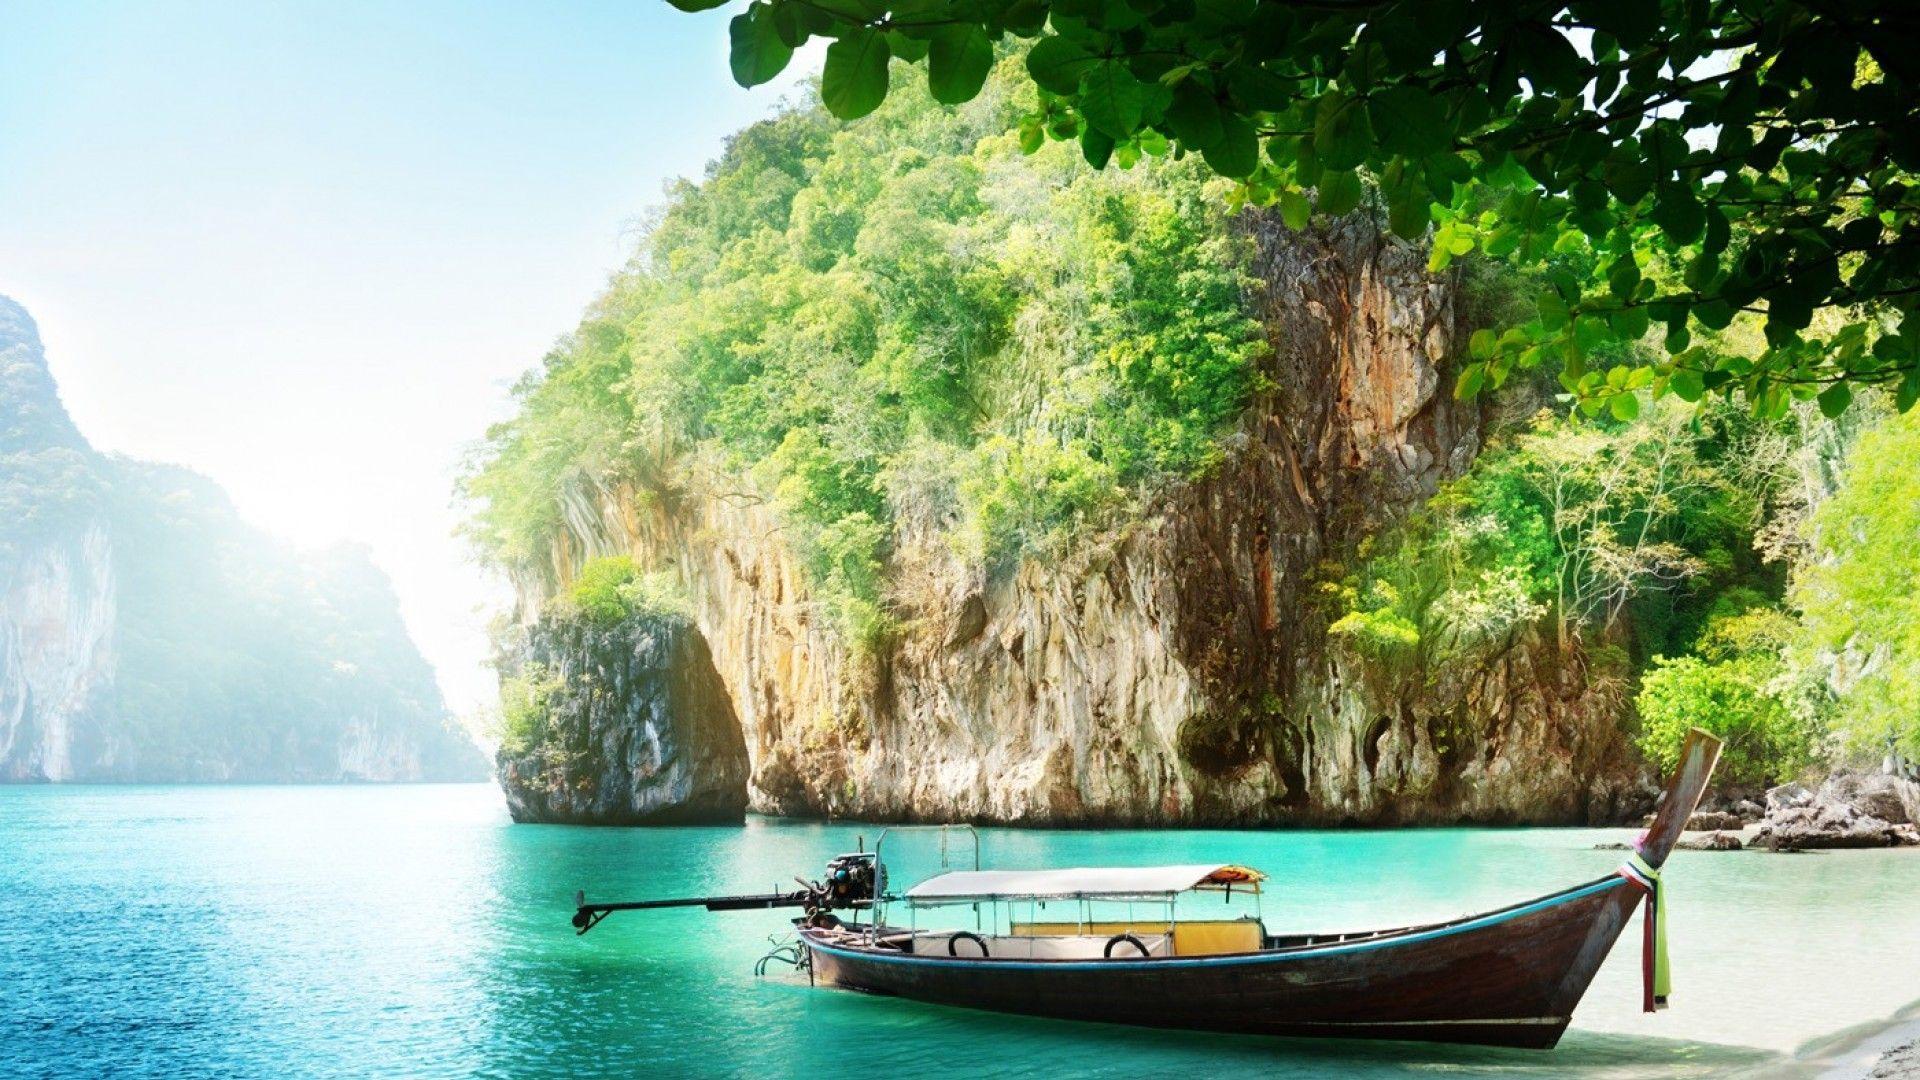 Thailand Beach Wallpapers - Wallpaper Cave